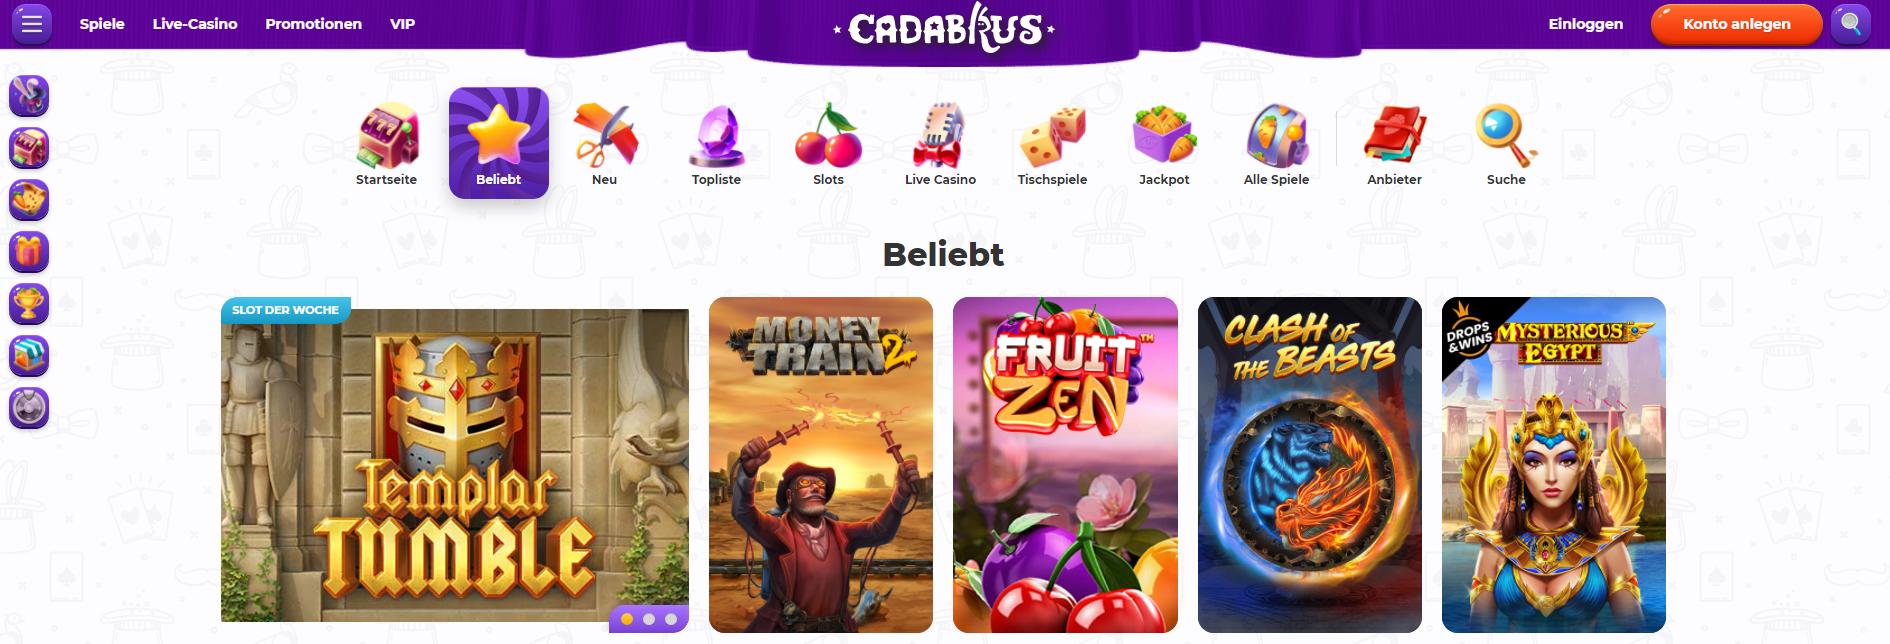 casino-cadabrus-beliebte-spiele-bonus-slots